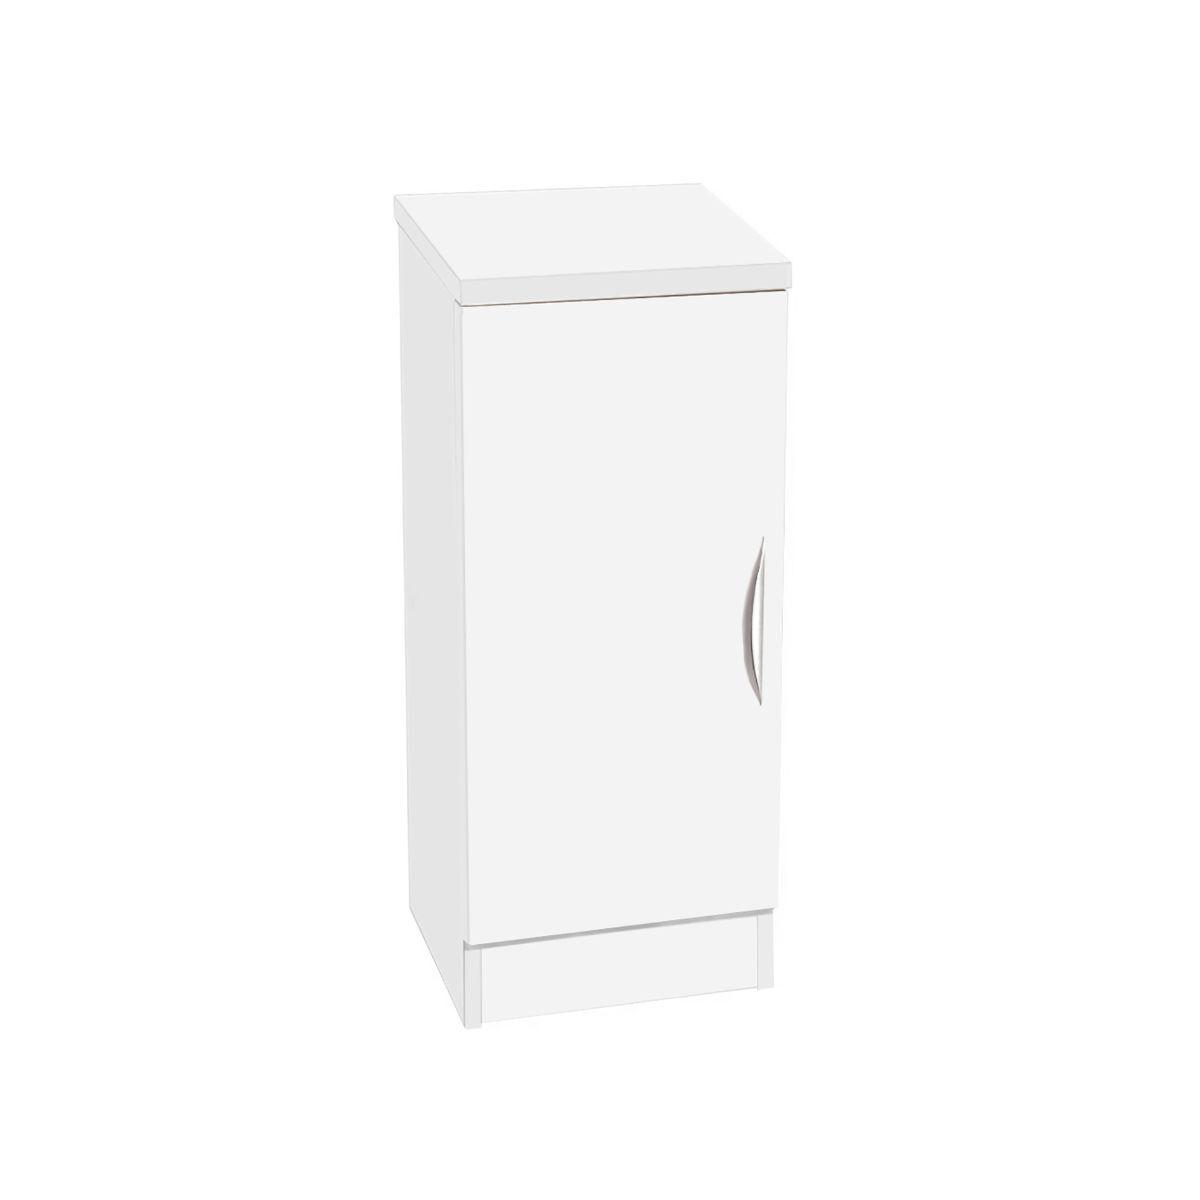 R White Desk Height Narrow Cupboard 30cm White Satin